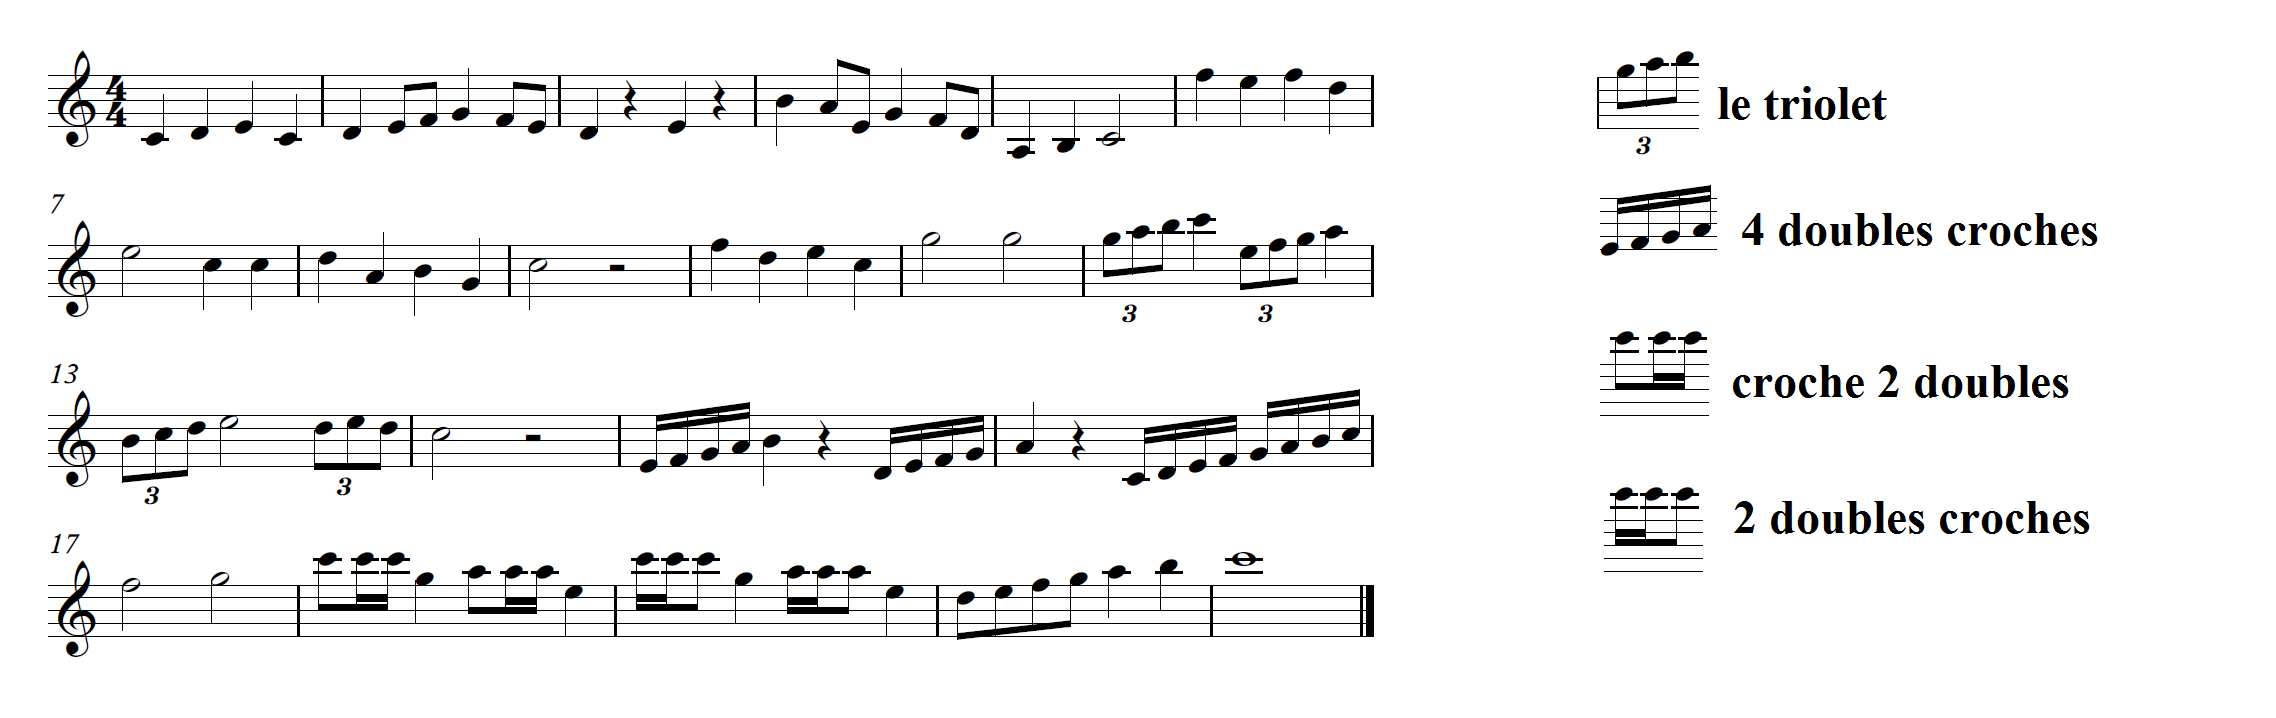 leçon 5 rythmes.png